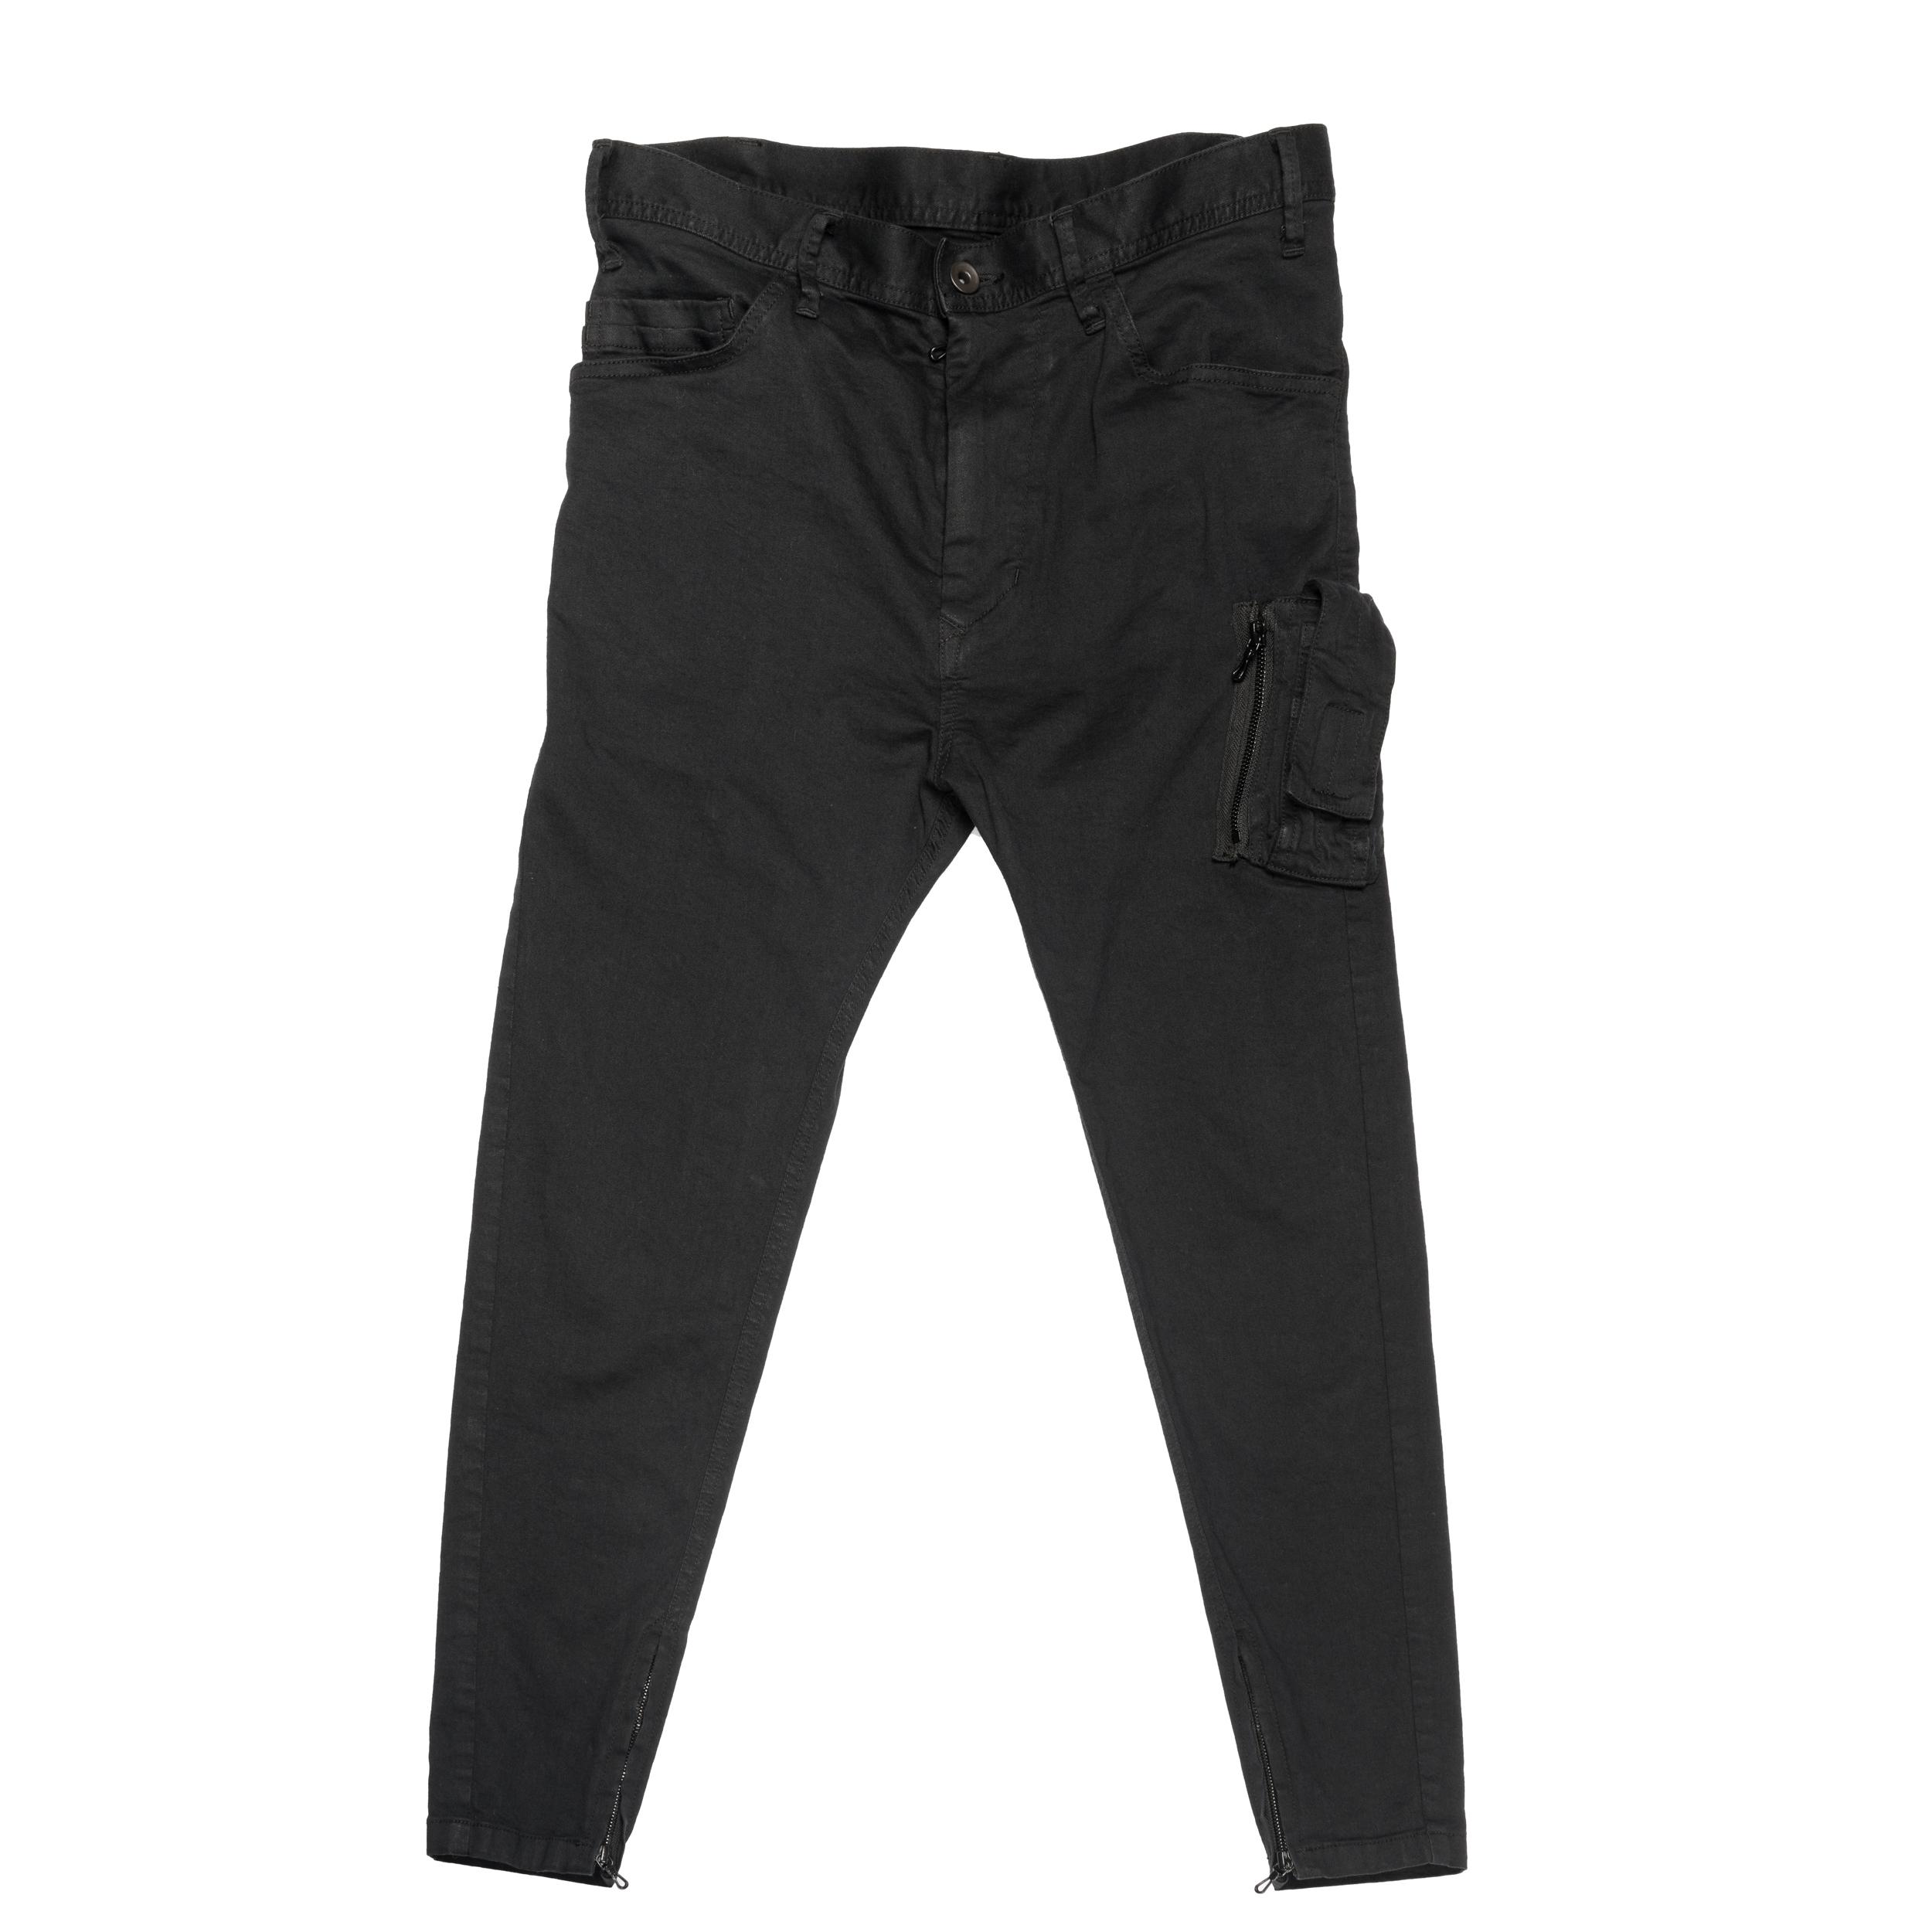 667PAM7-BLACK / MA-1 ポケットスキニーパンツ